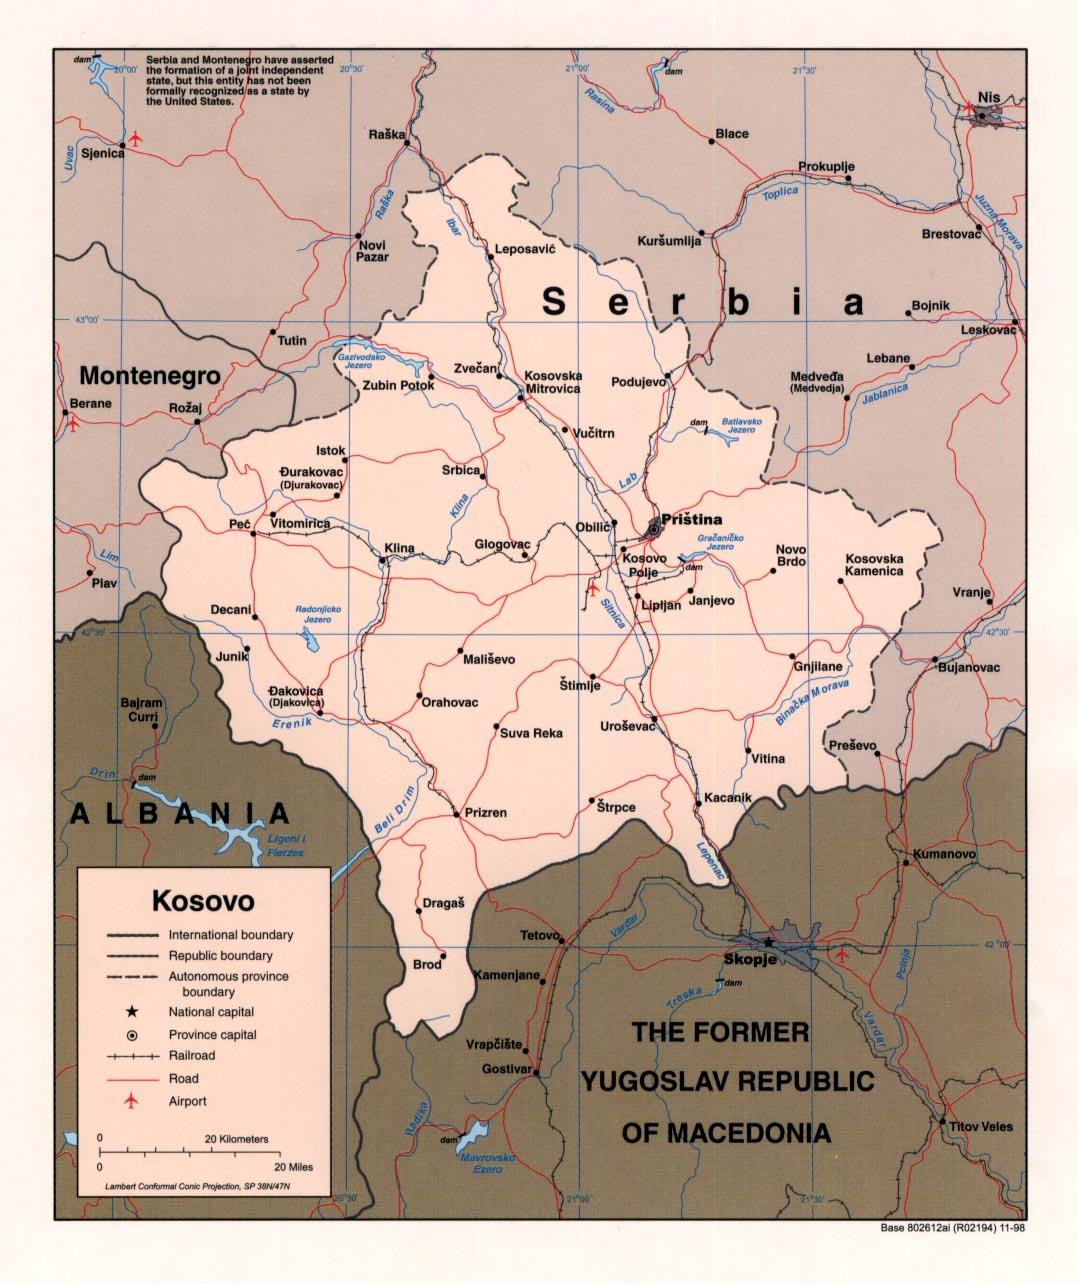 Mapa Politico de Kosovo